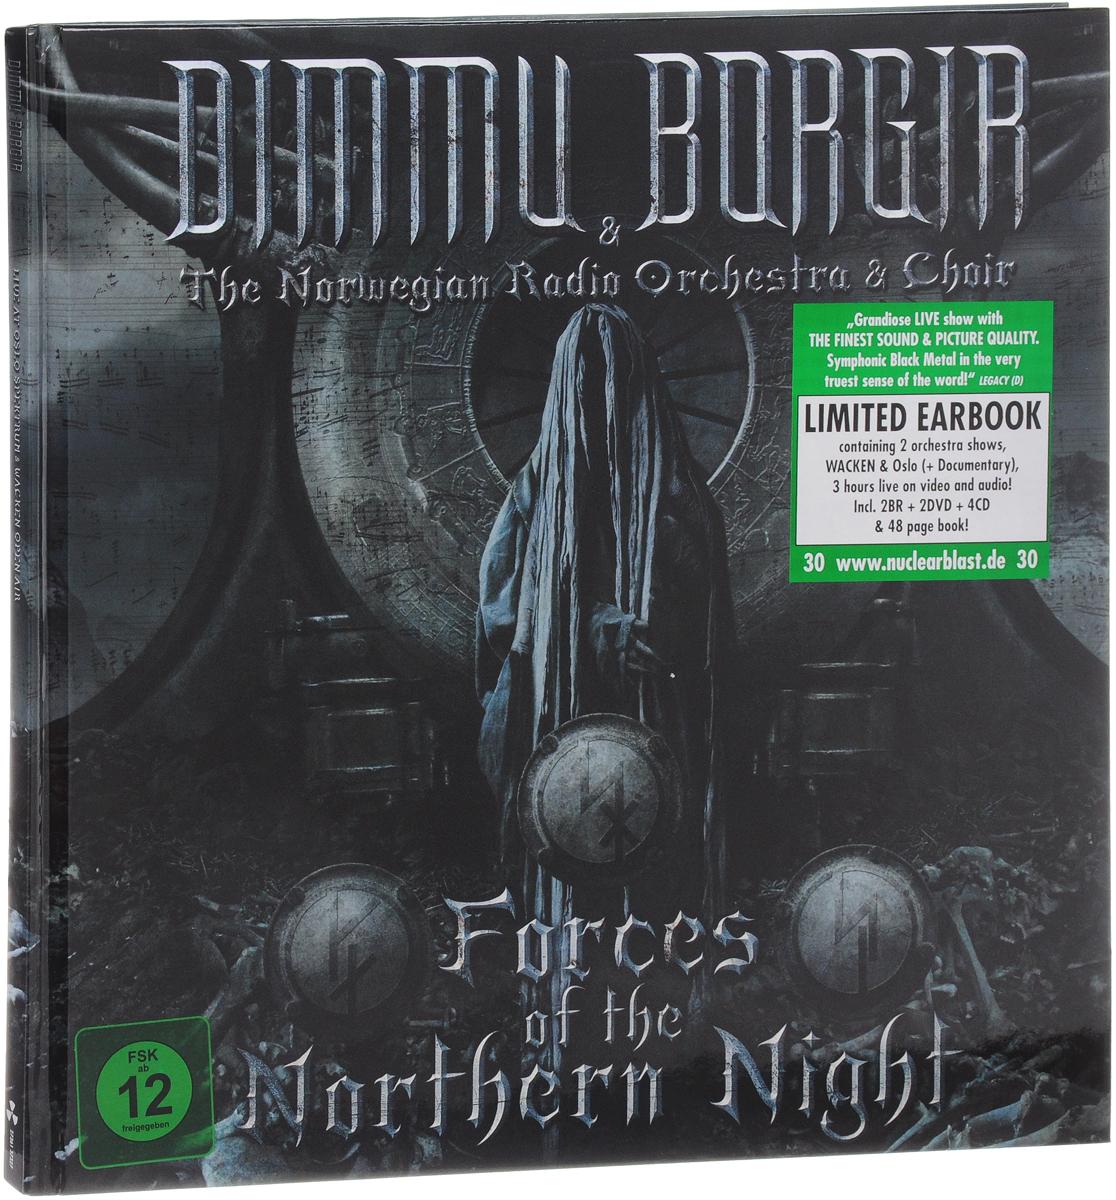 Dimmu Borgir & The Norwegian Radio Orchestra & Choir: Forces Of The Northern Night: Limited Earbook (2 Blu-ray + 2 DVD + 4 CD) би 2 – prague metropolitan symphonic orchestra vol 2 cd